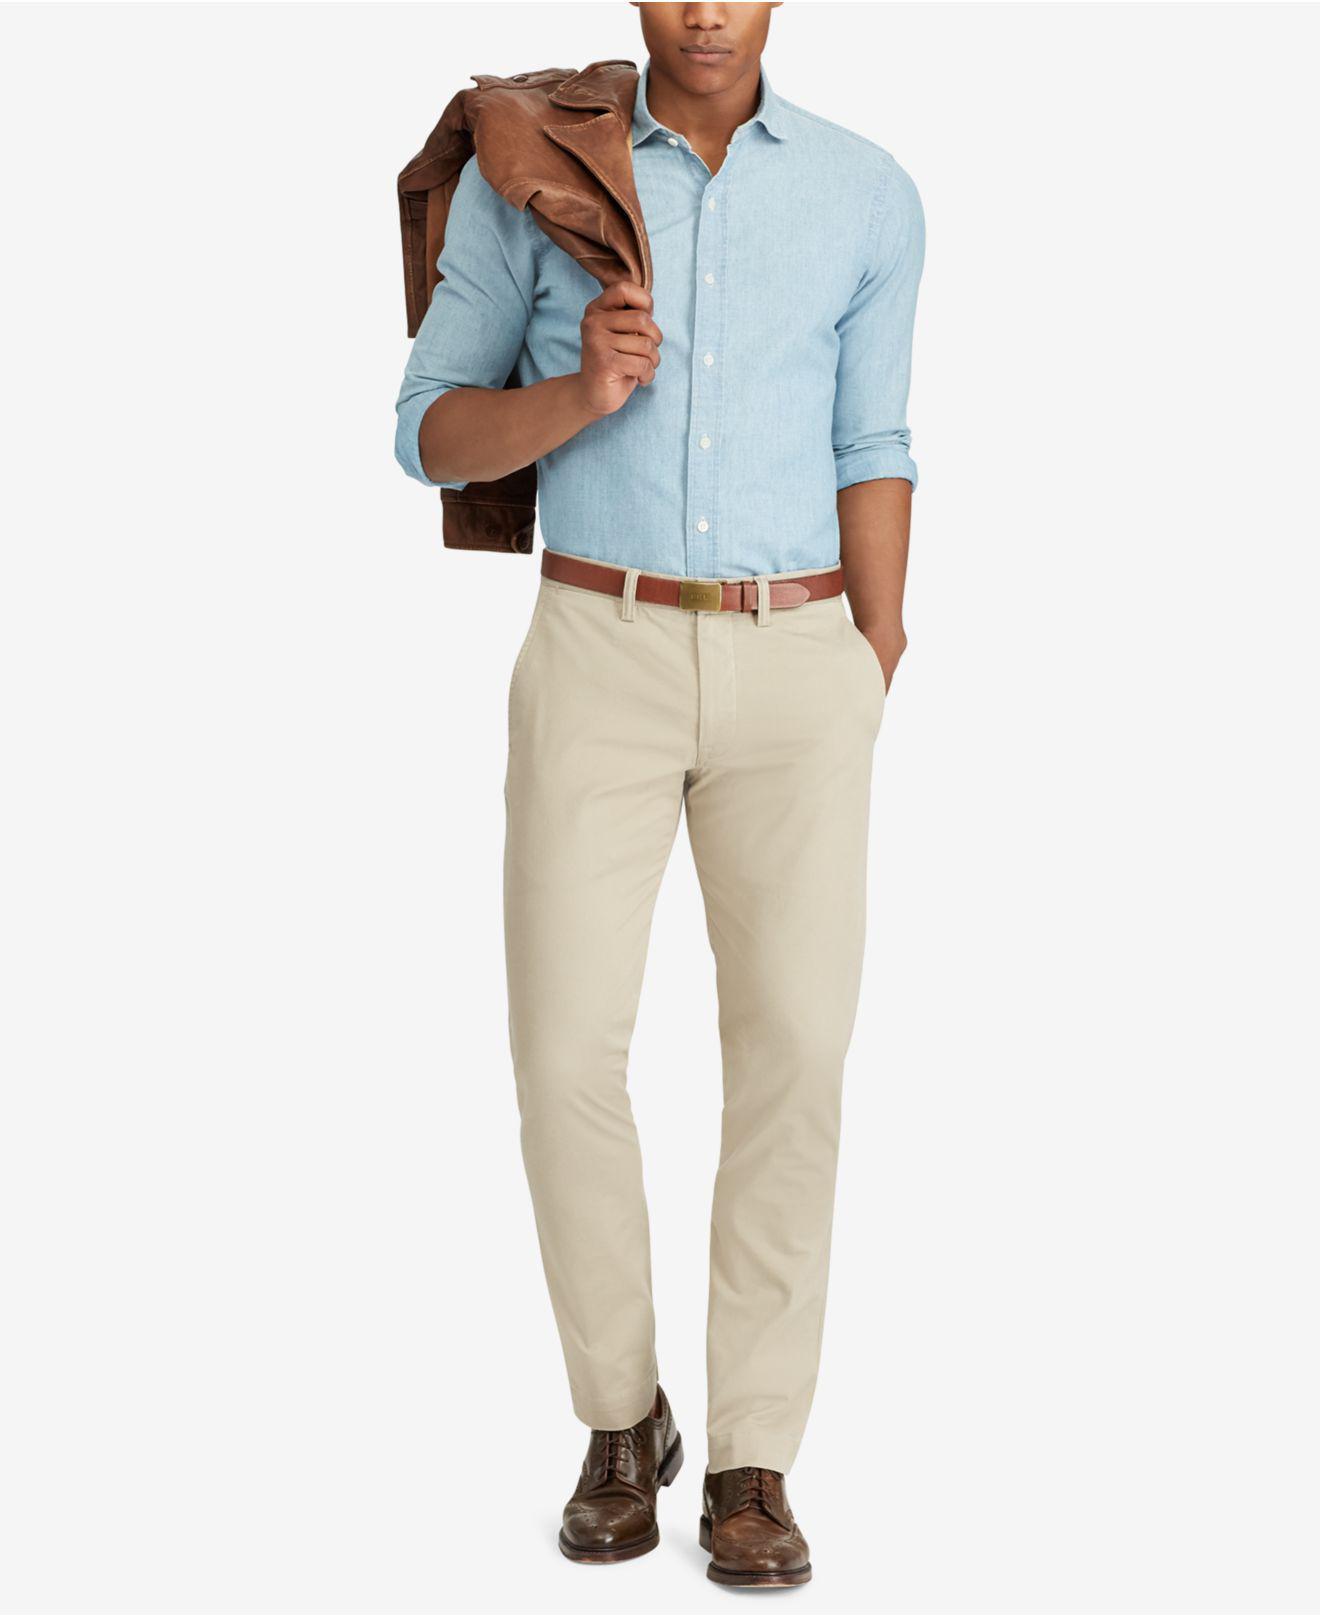 9b686cd99337f Polo Ralph Lauren - Natural Men s Hampton Straight-fit 5-pocket Pants for  Men. View fullscreen